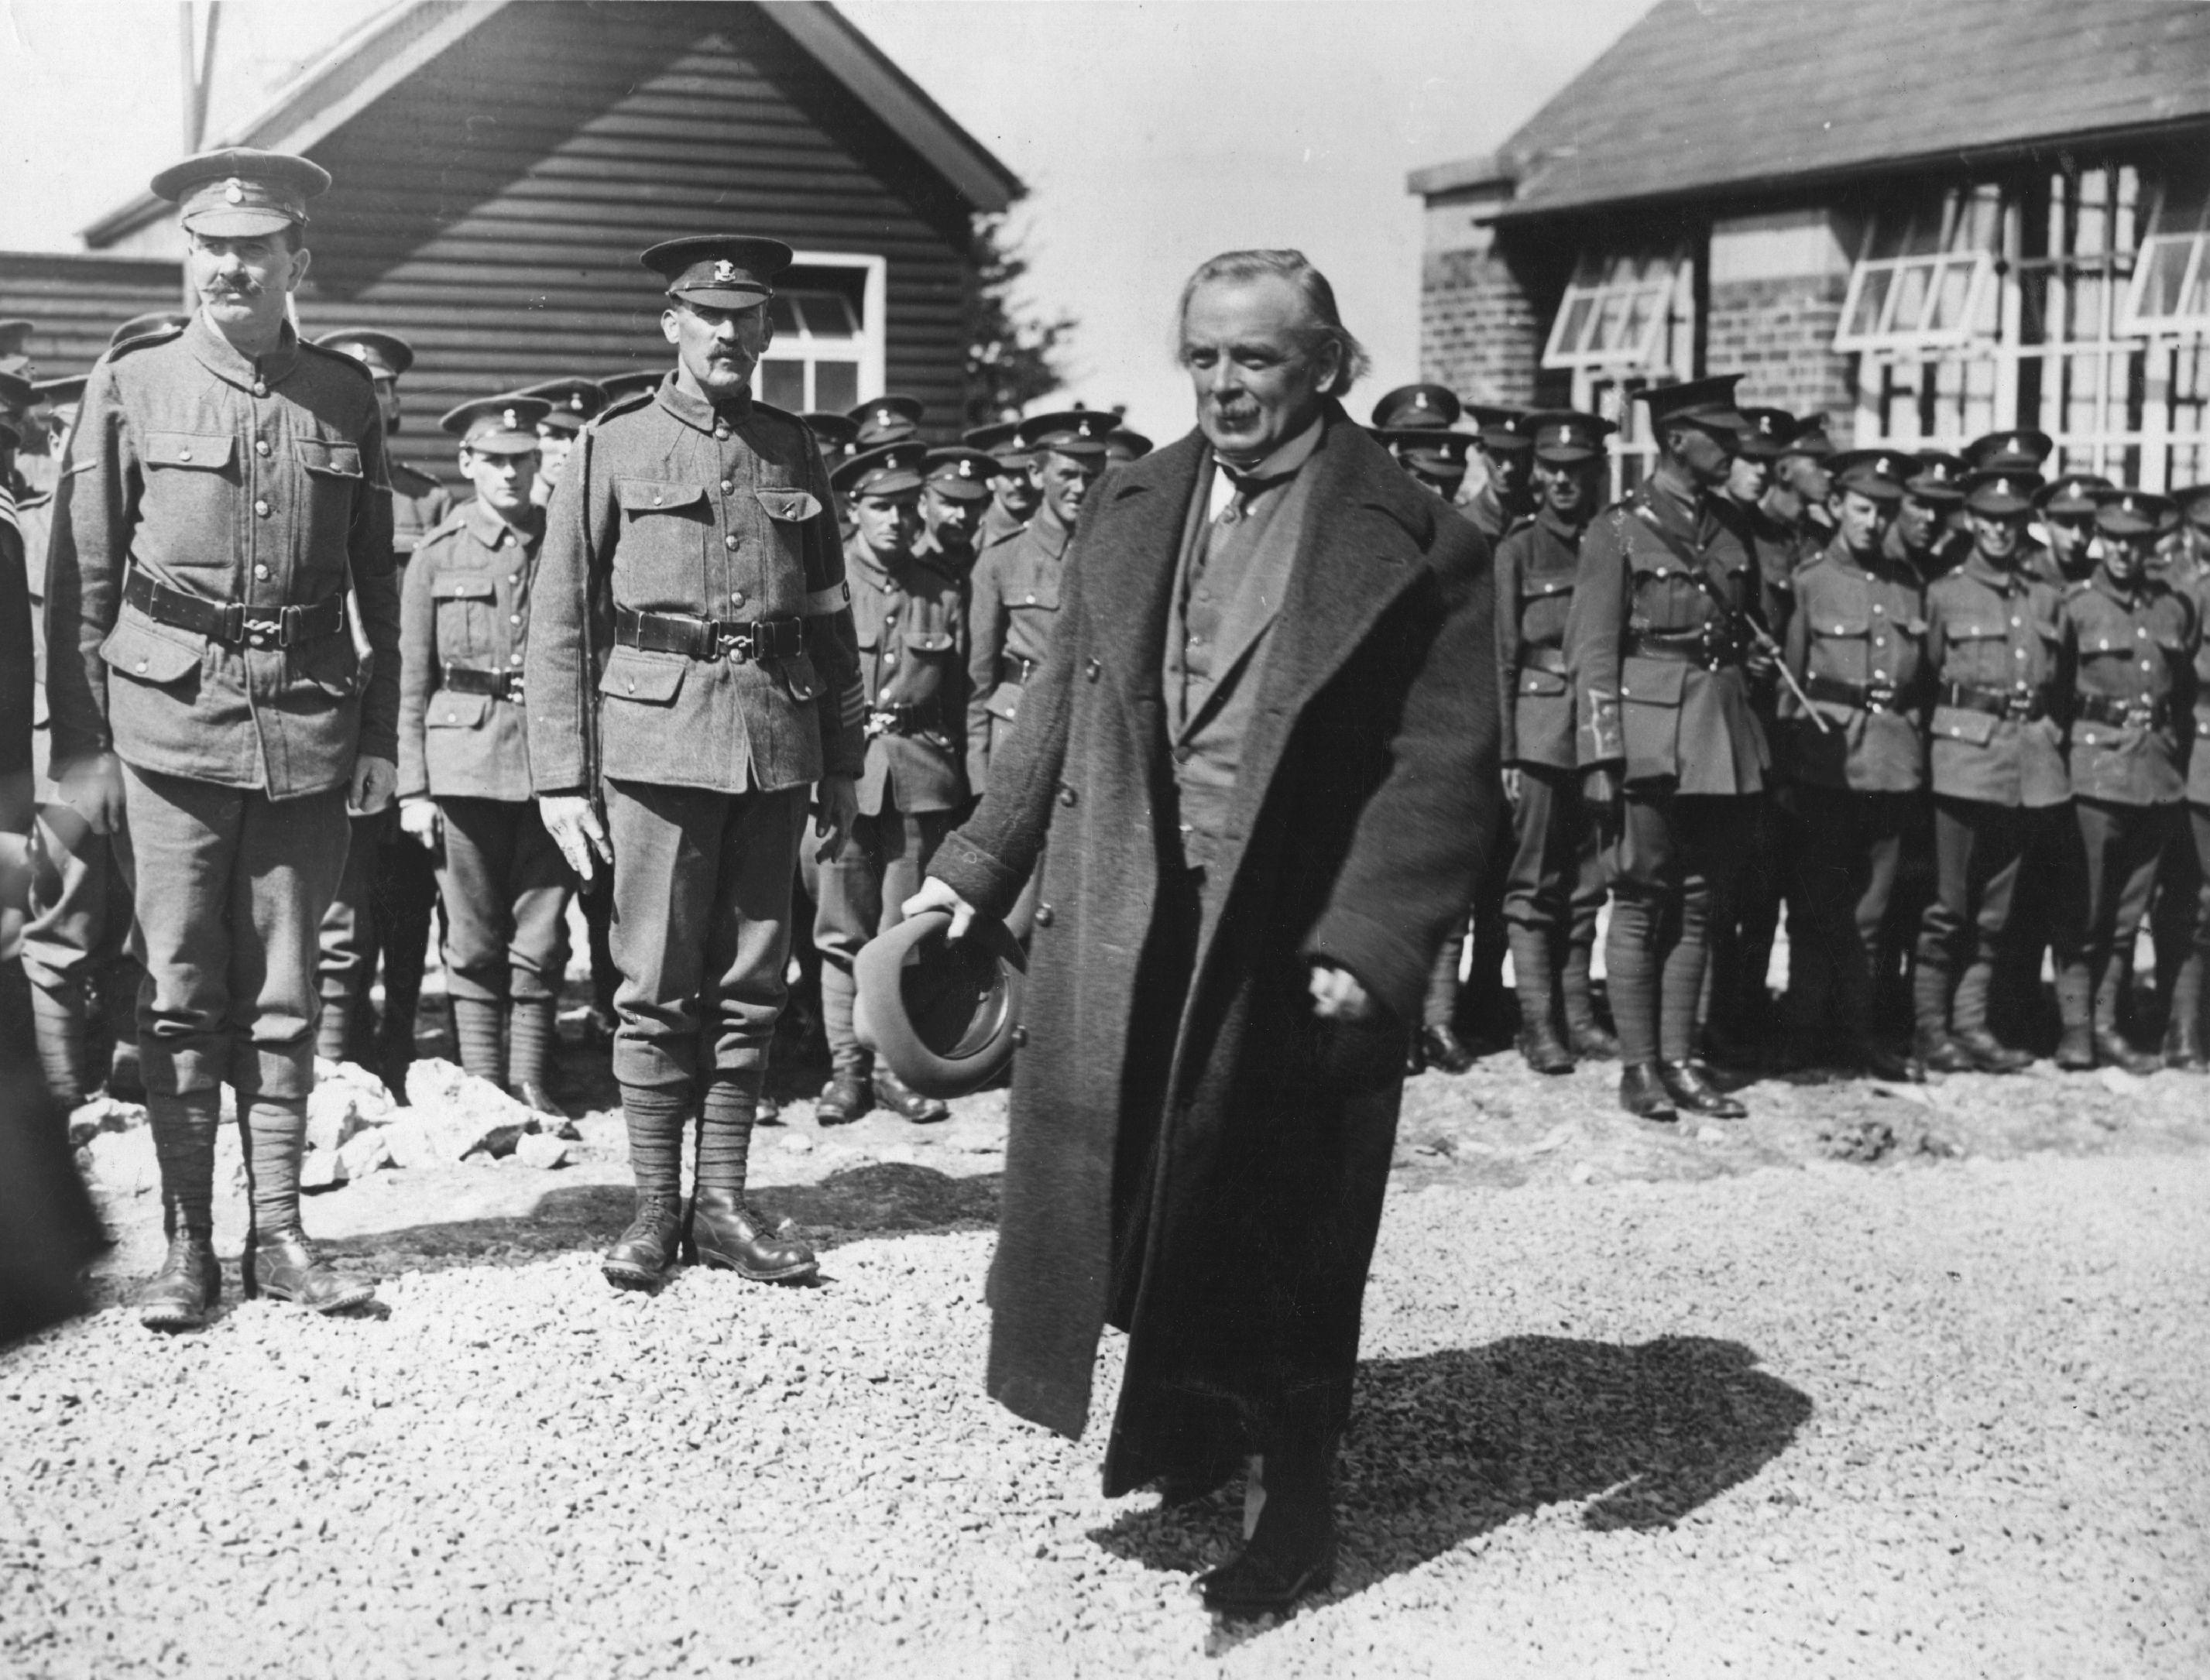 PM At Military Camp